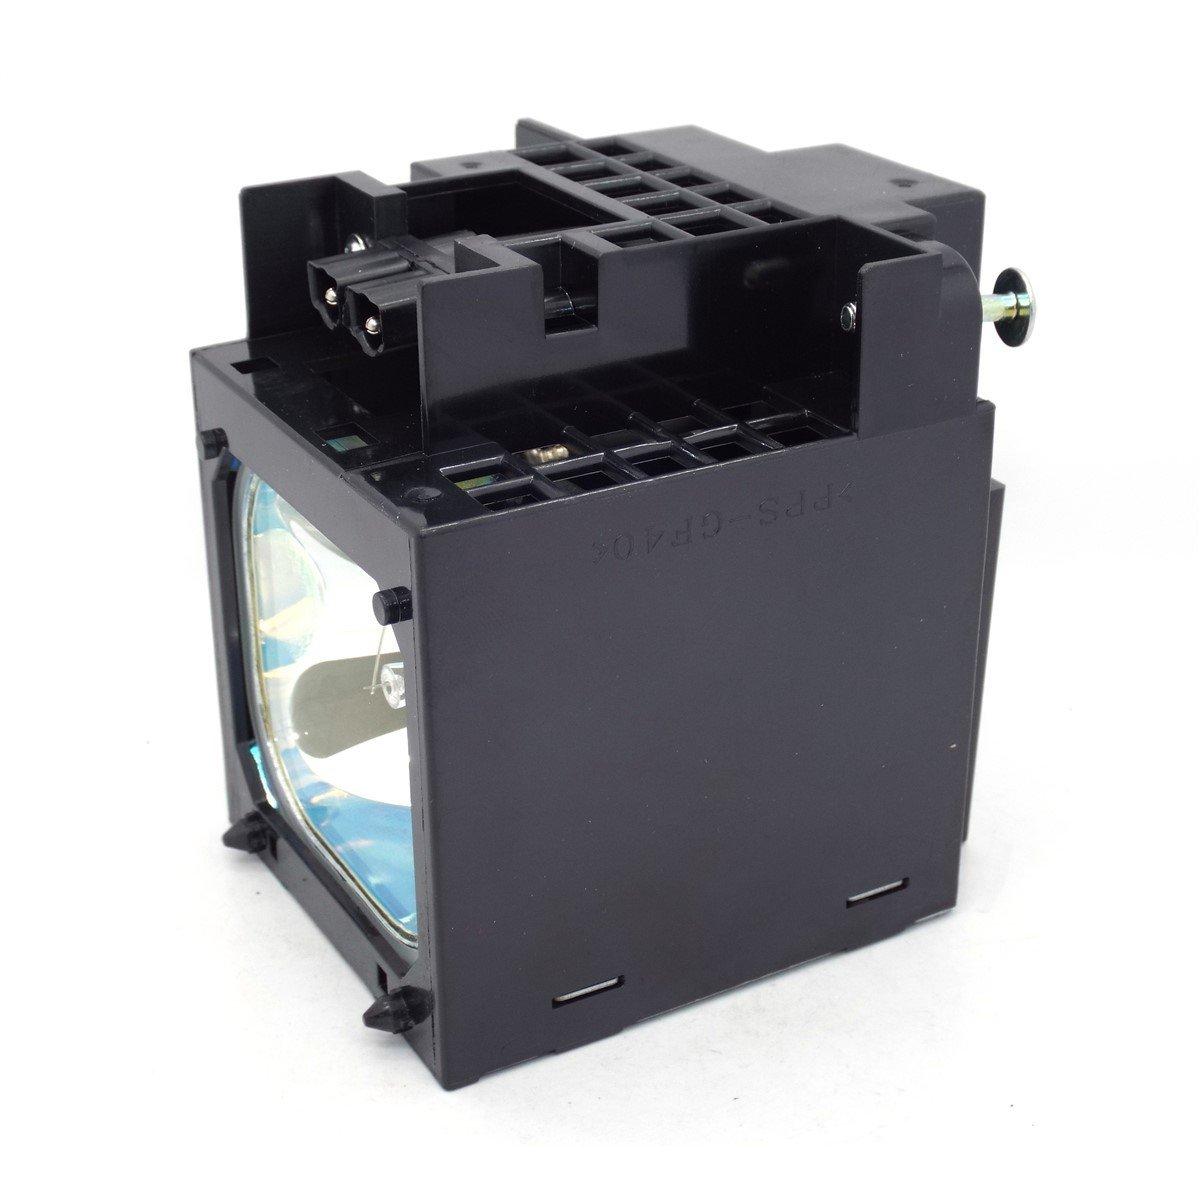 XL2100 Sony KF 60SX300 TV Lamp 100% new original bare projector lamp xl2100 for kf 50we620 kf 60sx300 kf 60we610 kf we50 kf we42 kf we50a1